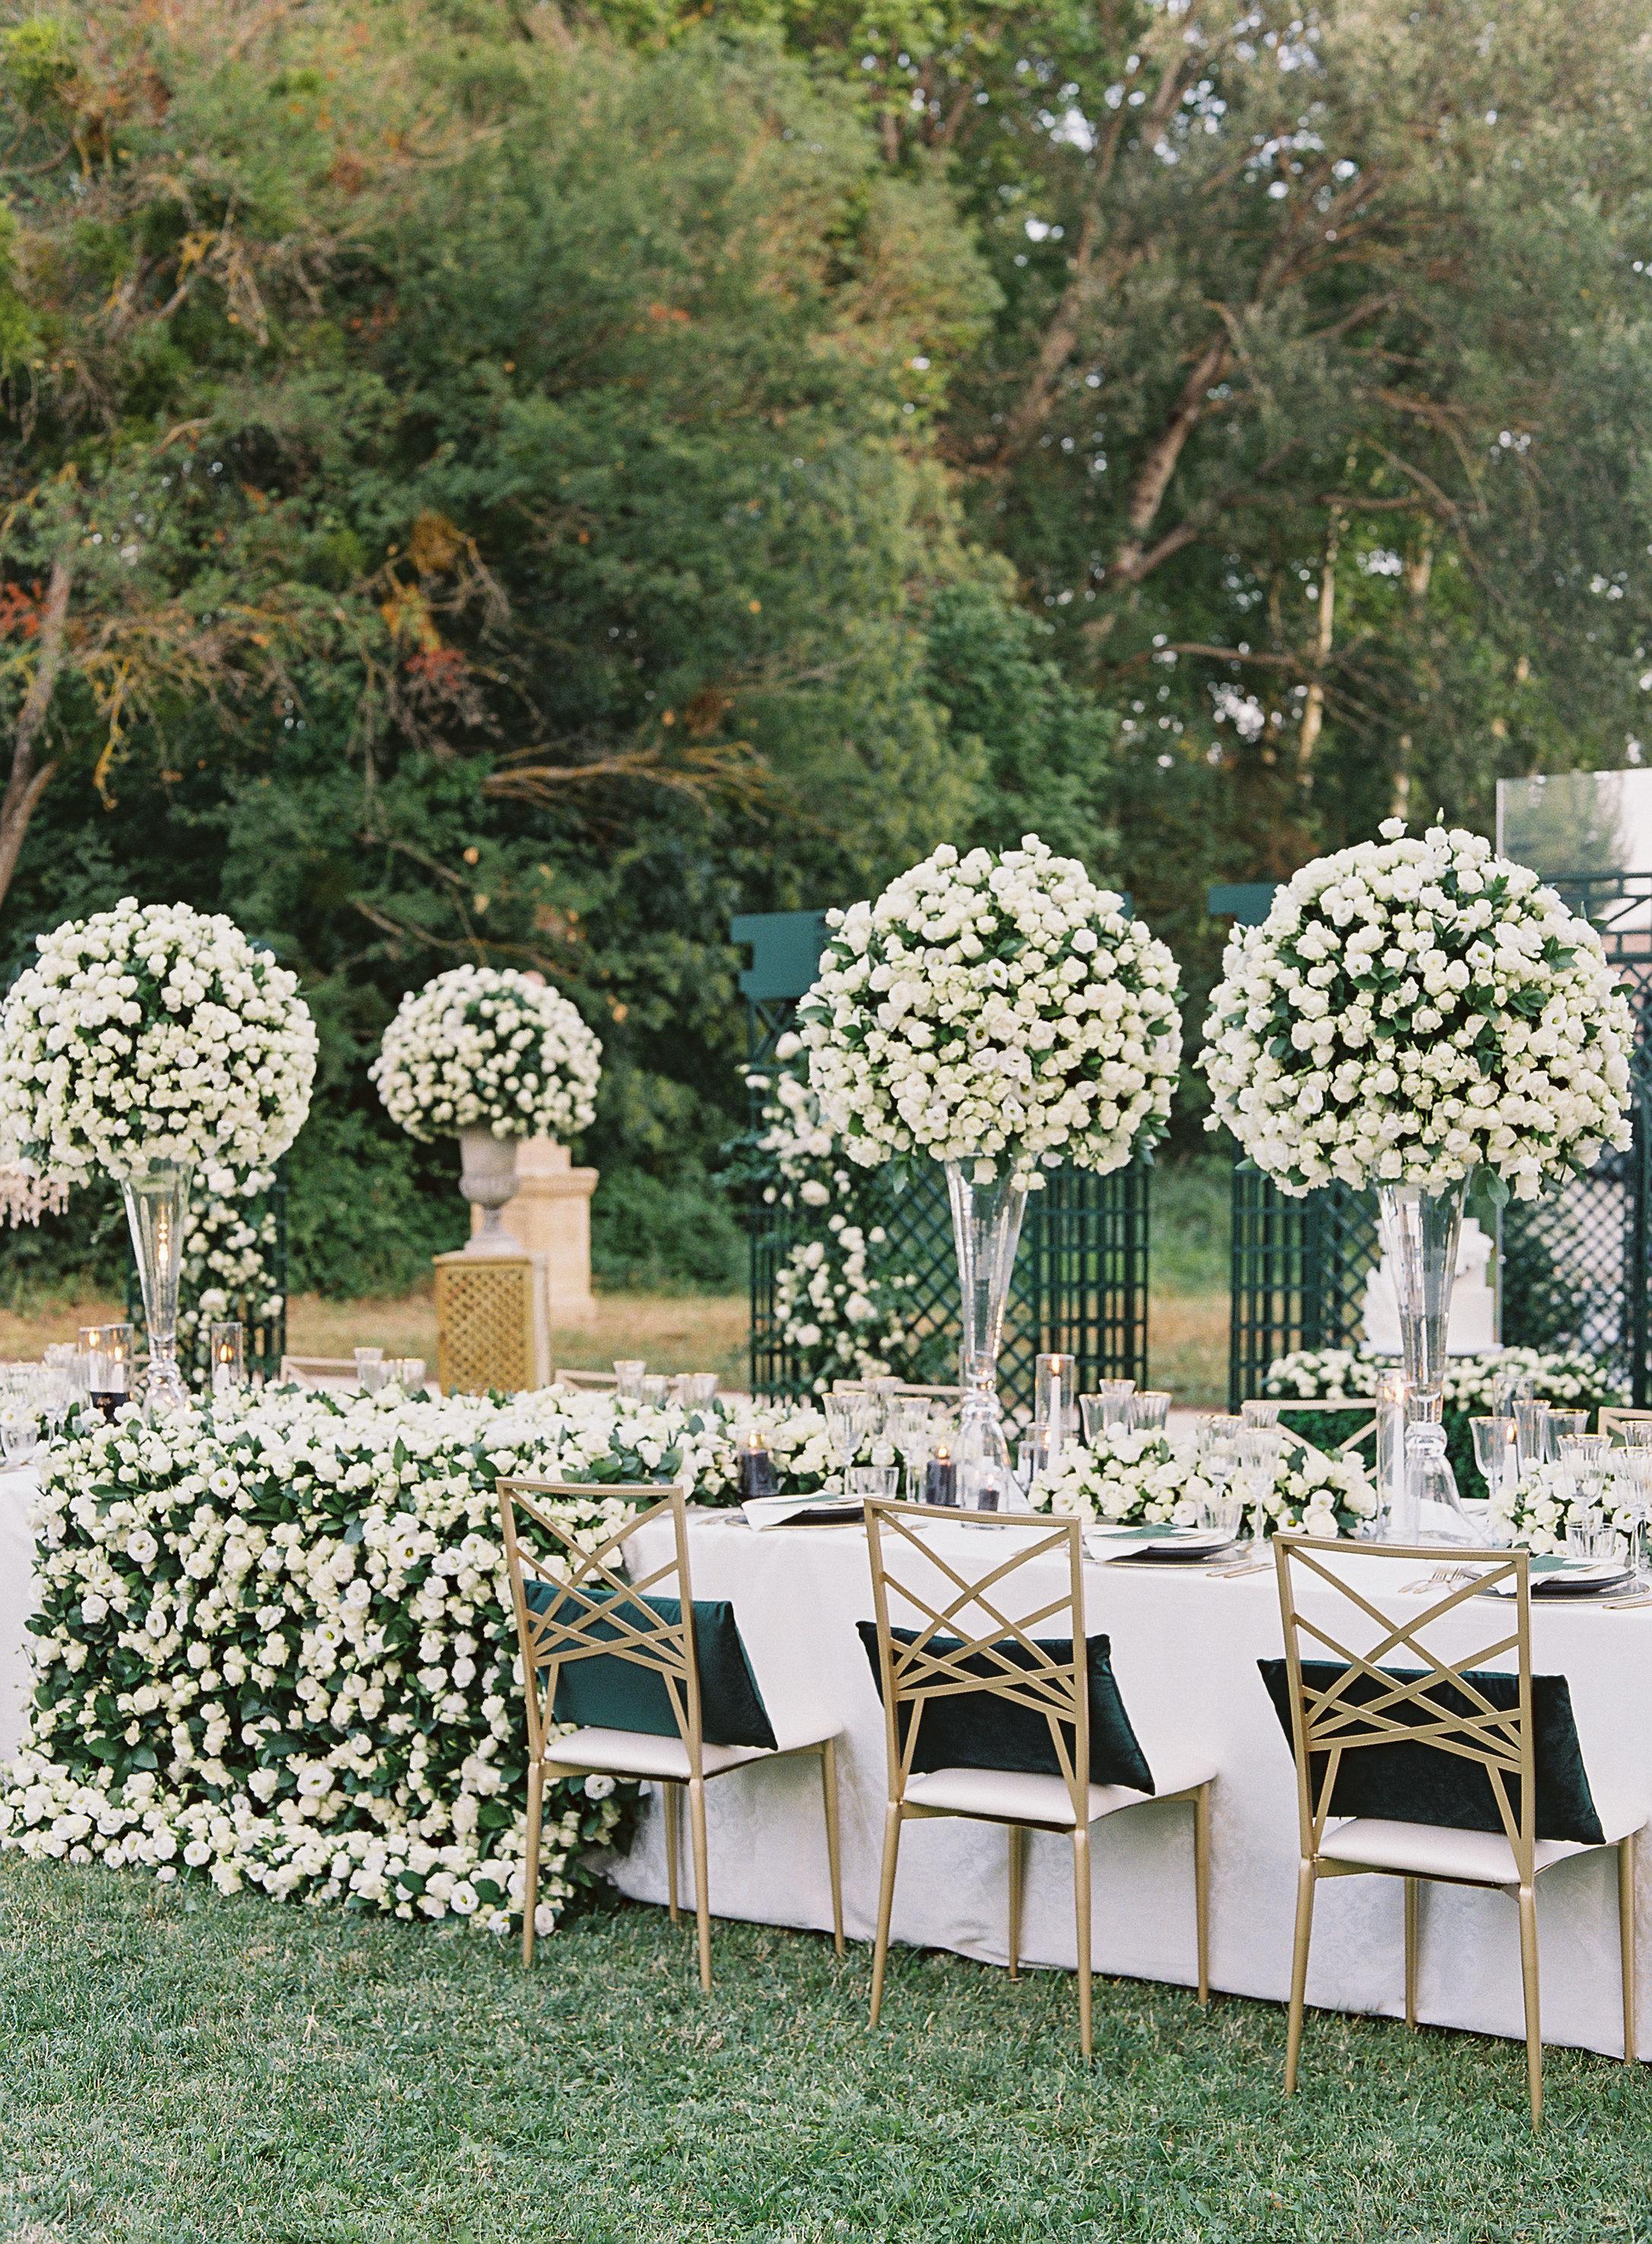 janet patrick wedding reception table in garden